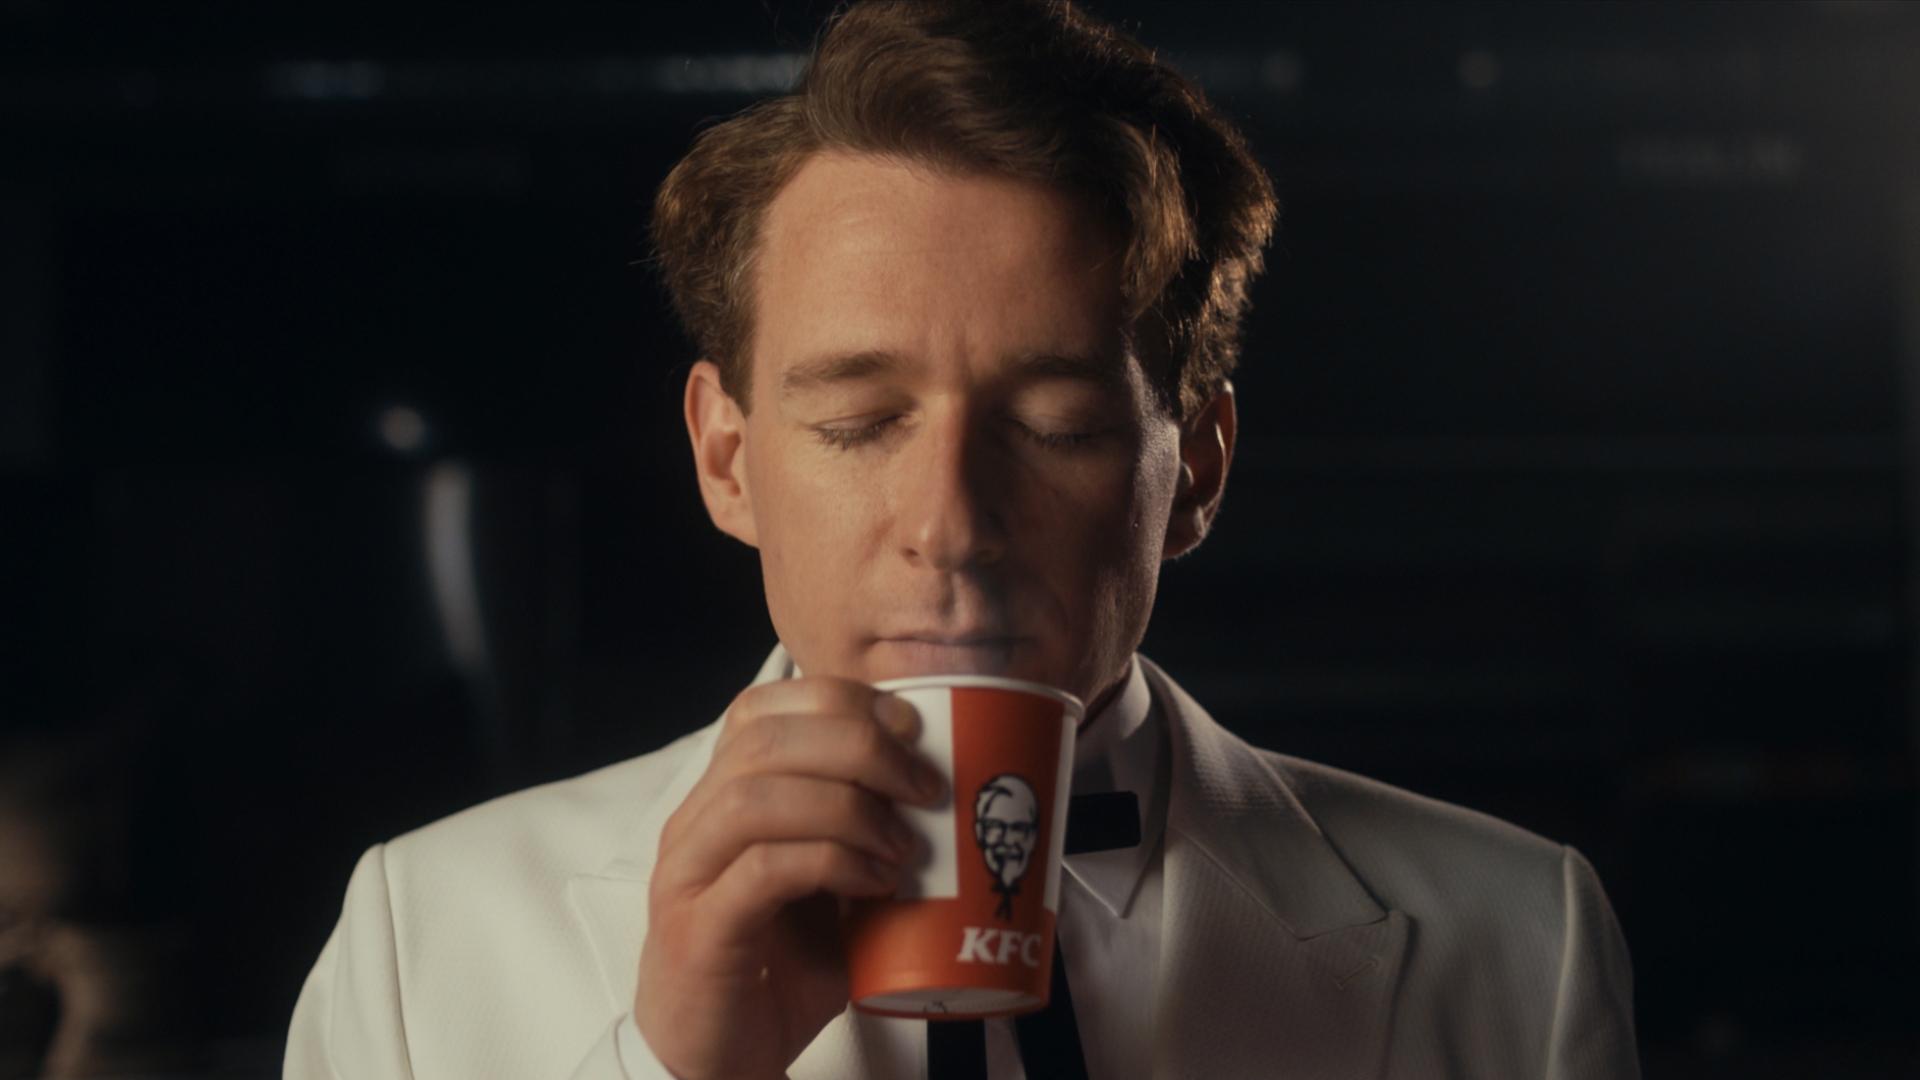 KFC & Nestlé Professional Güçlerini Birleştirdi